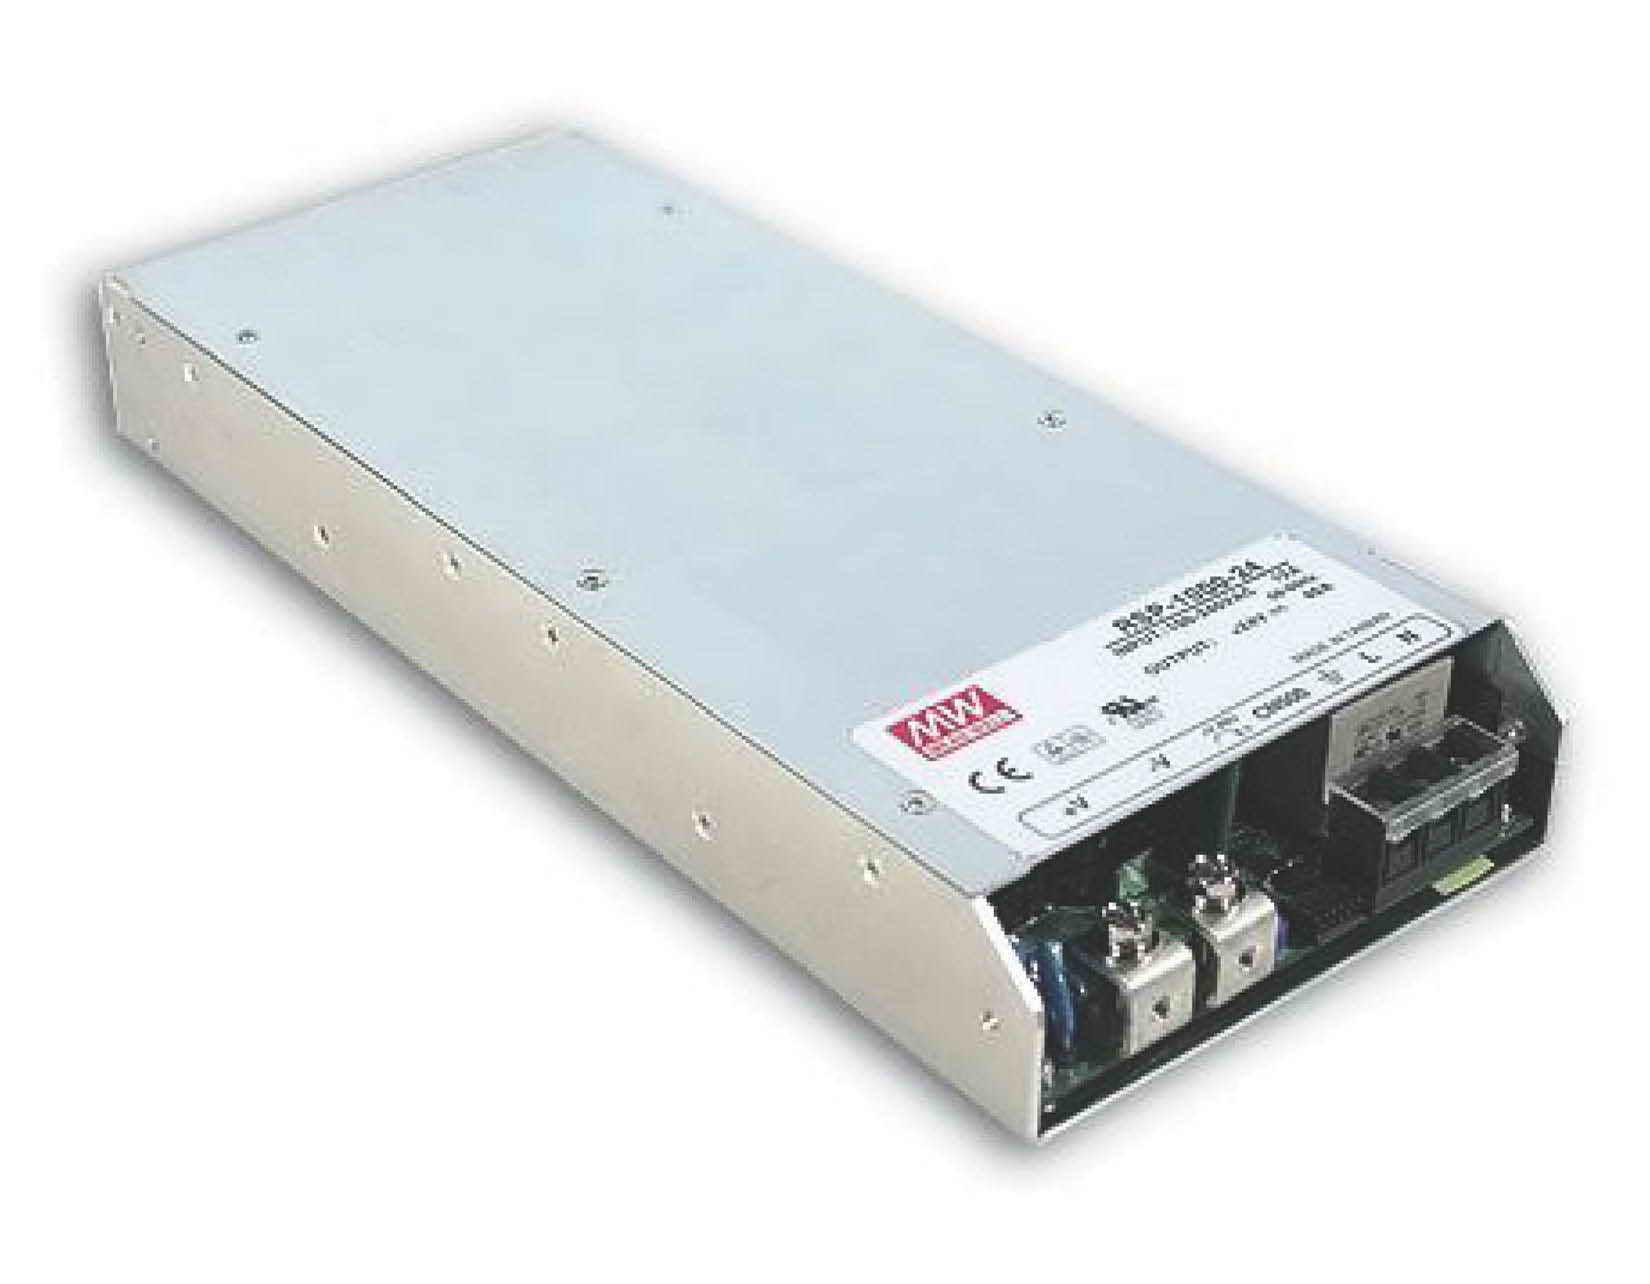 RSP-1000, منبع تغذیه کف خواب  مینول 1000 وات, RSP-1000-12, RSP-1000-24, RSP-1000-48, Mean Well , MW